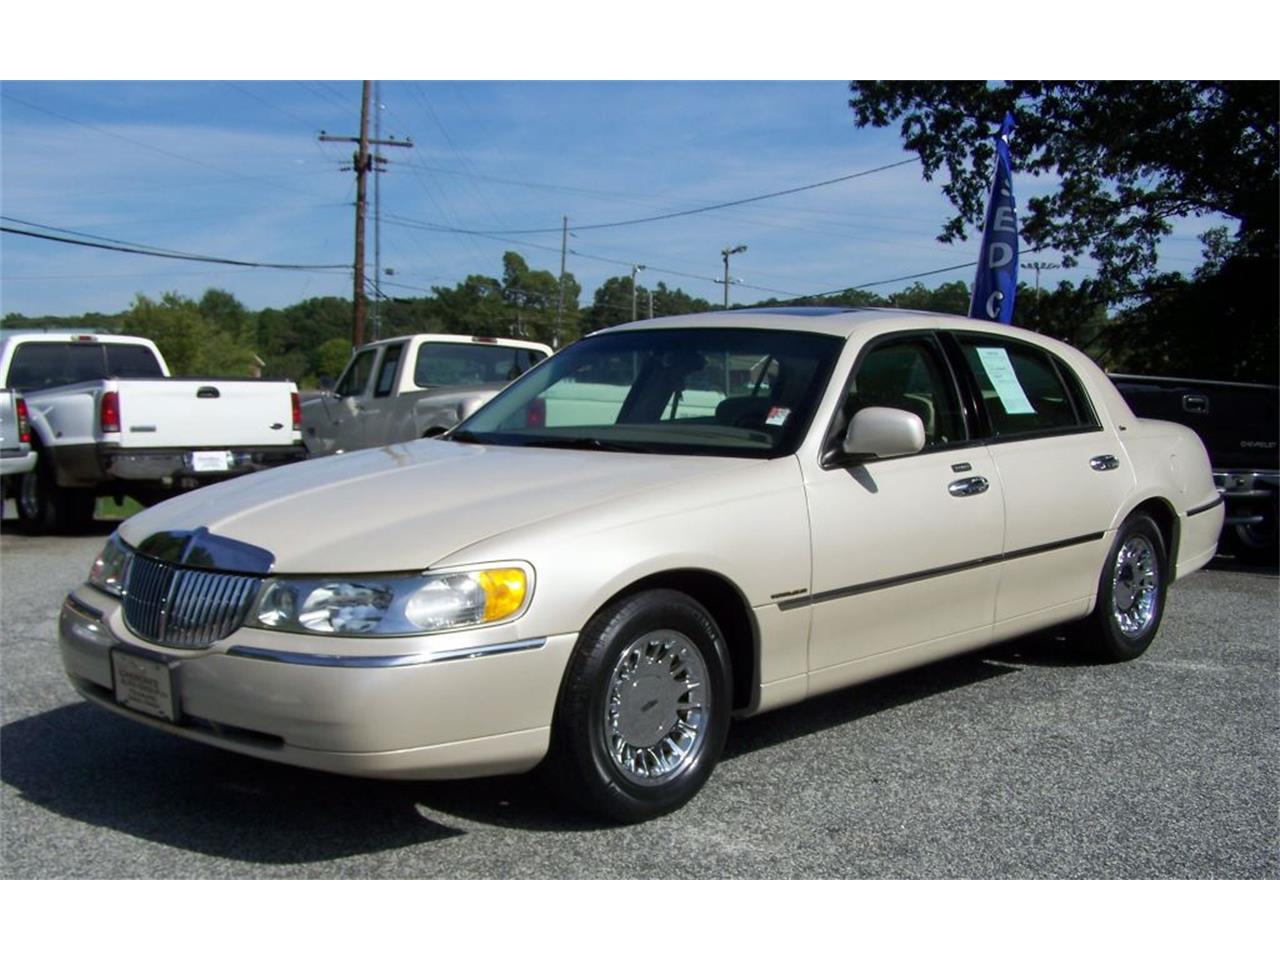 2002 Lincoln Town Car Cartier 4d For Sale Classiccars Com Cc 743440